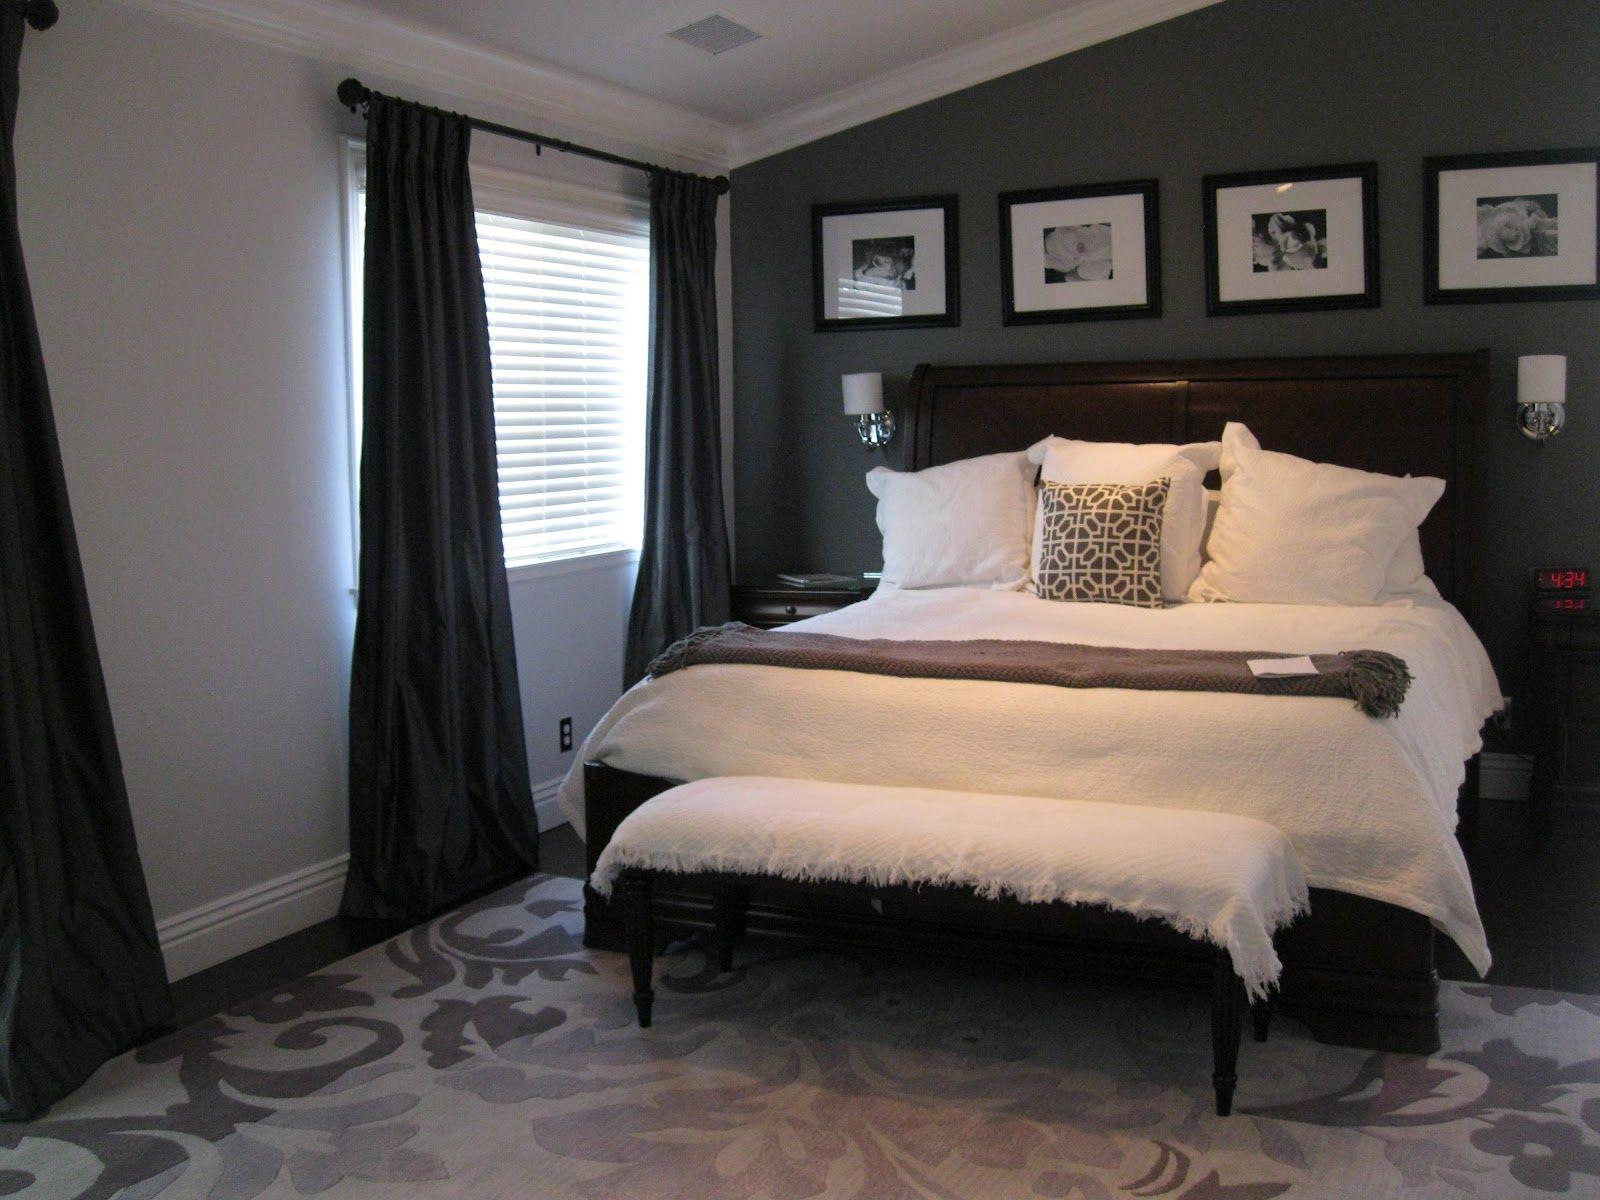 img_2890 1,600×1,200 pixels | bedroom inspiration | pinterest